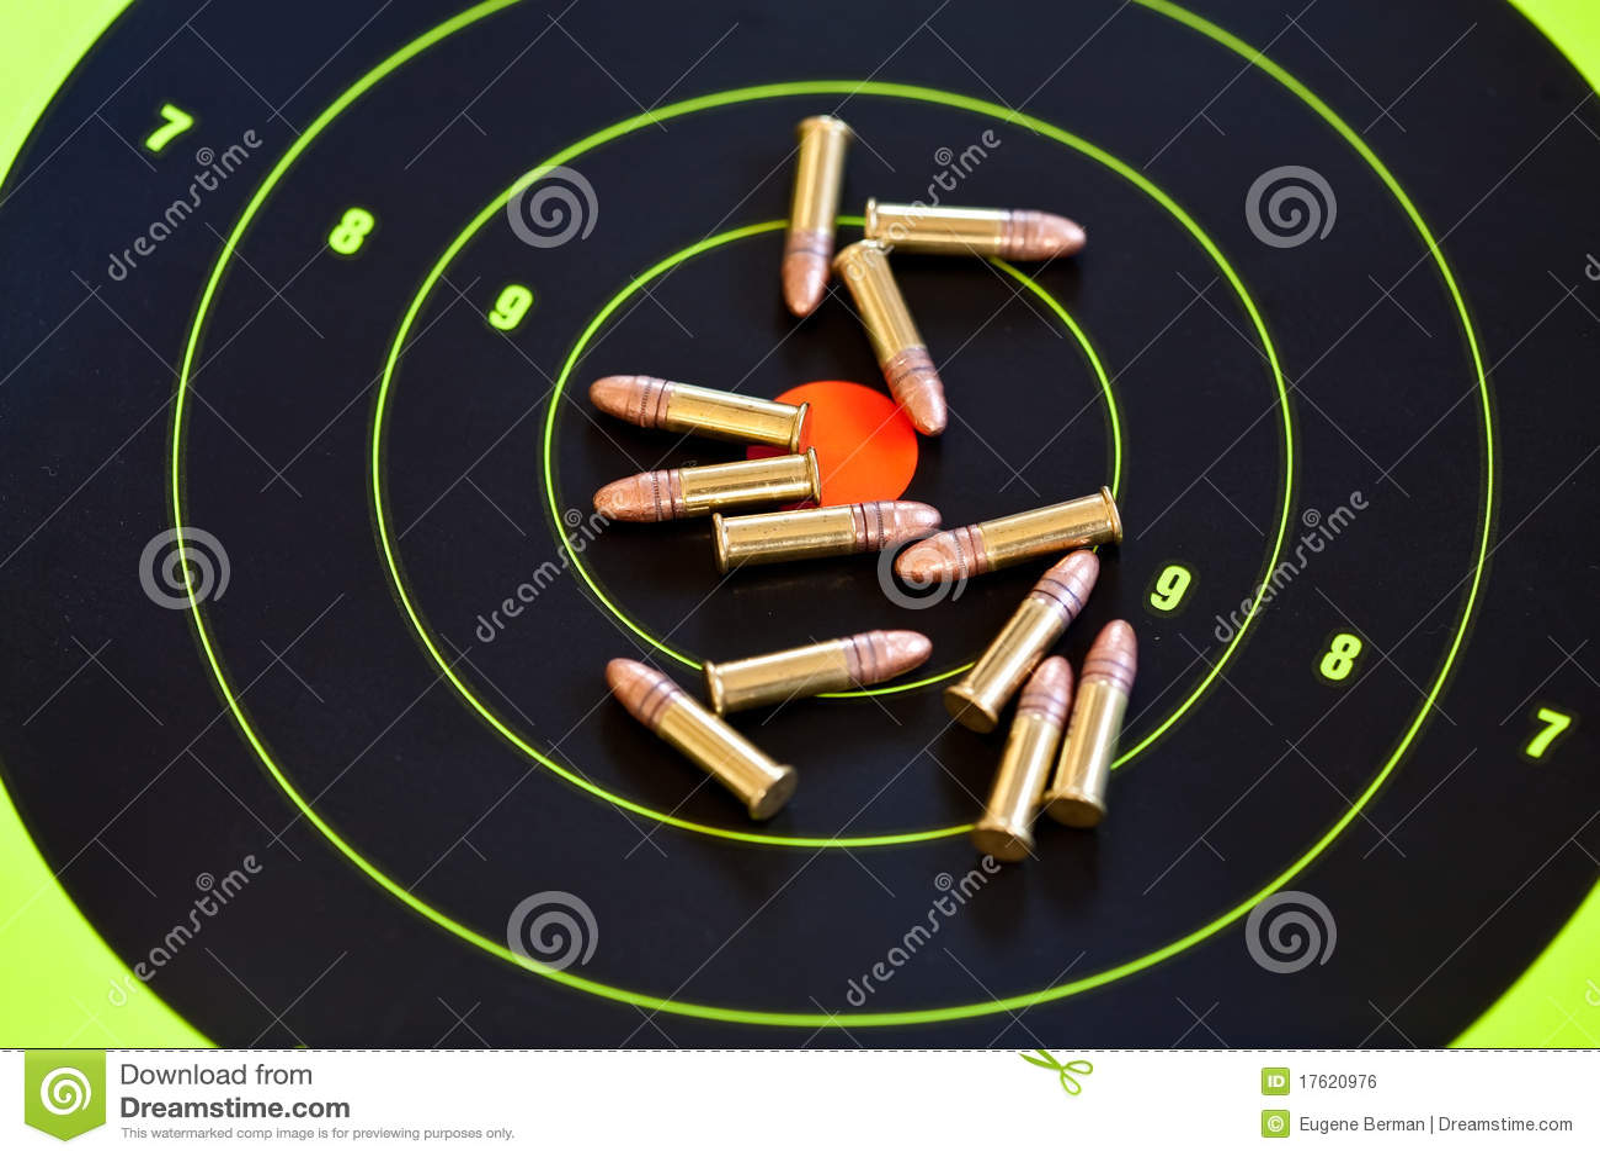 Royalty Free Stock Image: .22 LR caliber ammo